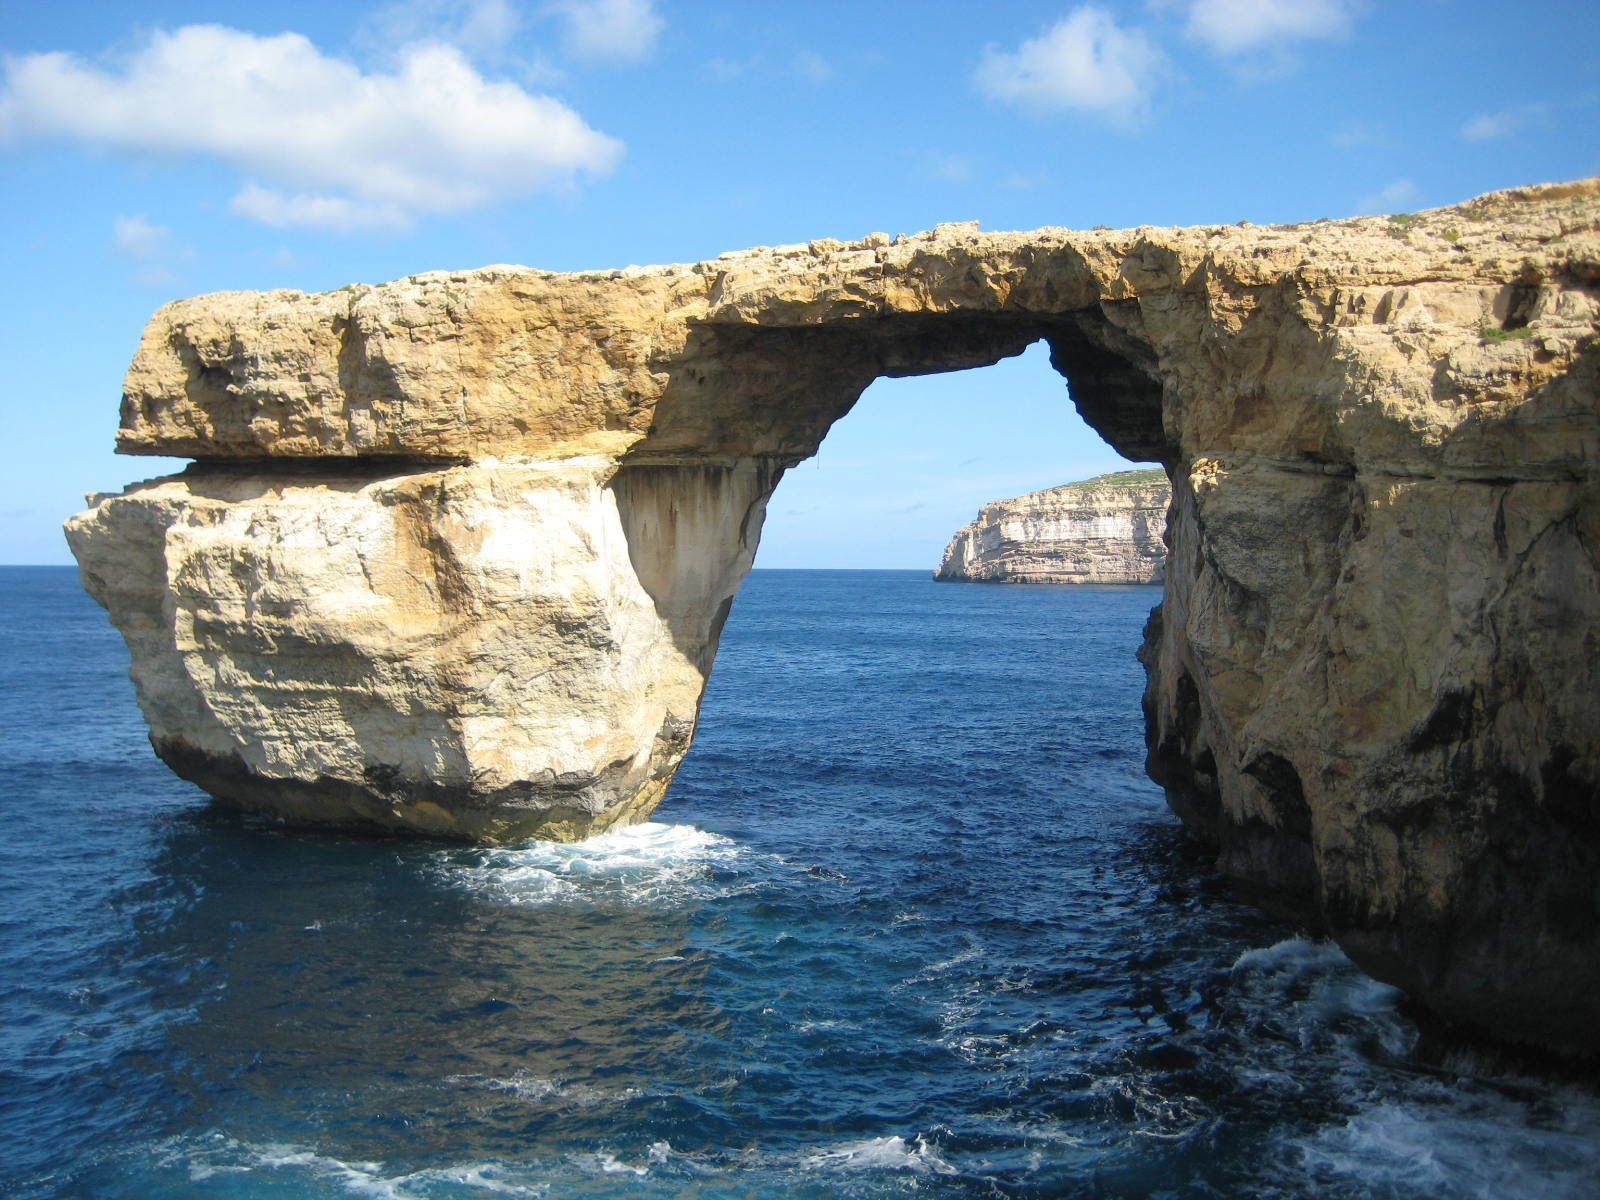 This is April 2014 image shows the landmark Azure Window located on the Maltese island of Gozo. (Caroline Hodgson via AP)